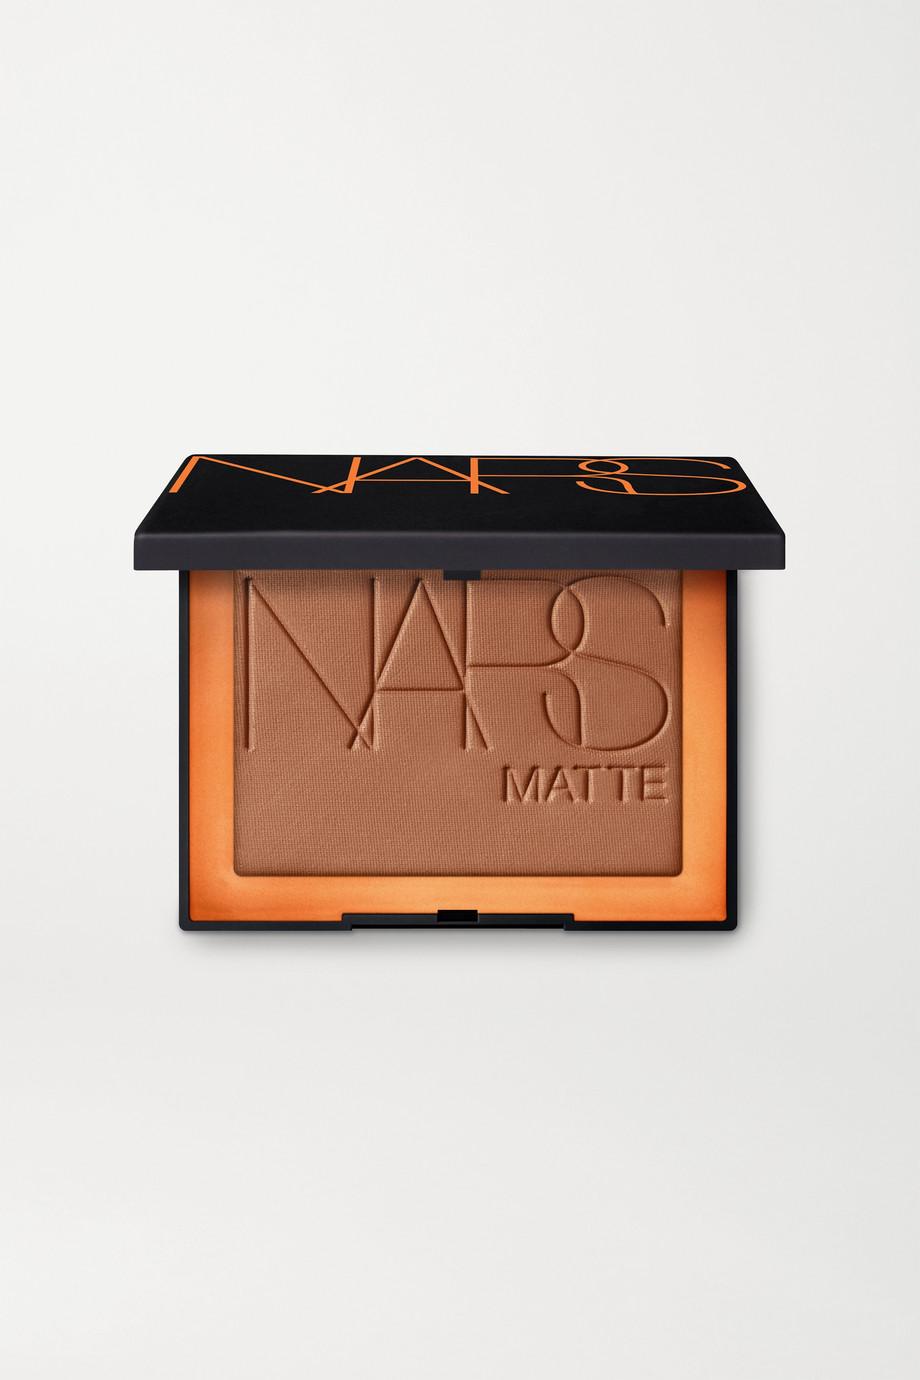 NARS Matte Bronzing Powder - Samoa